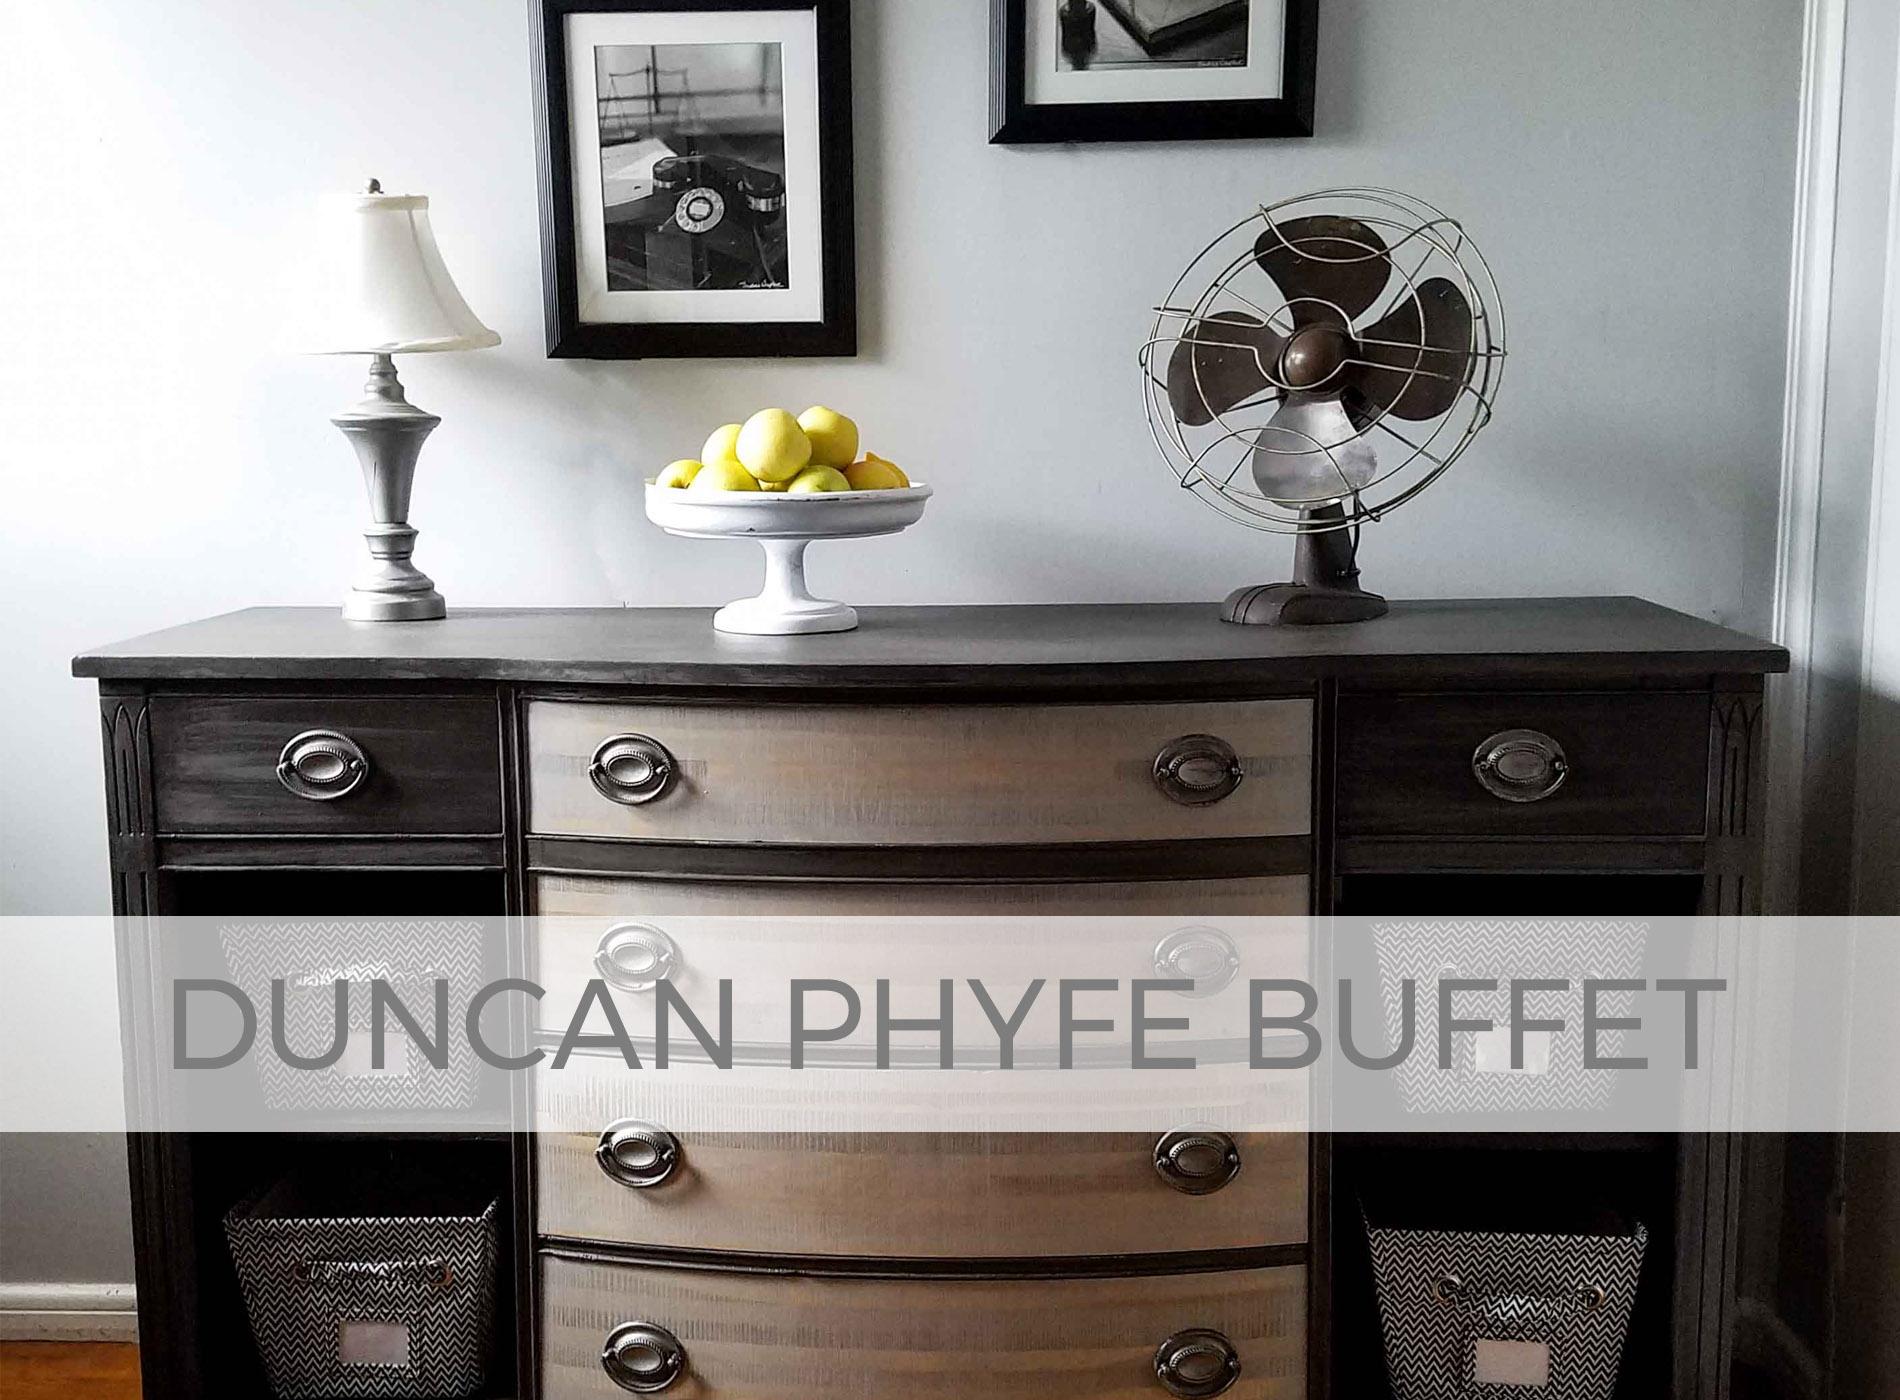 Duncan Phyfe Buffet by Prodigal Pieces | prodigalpieces.com